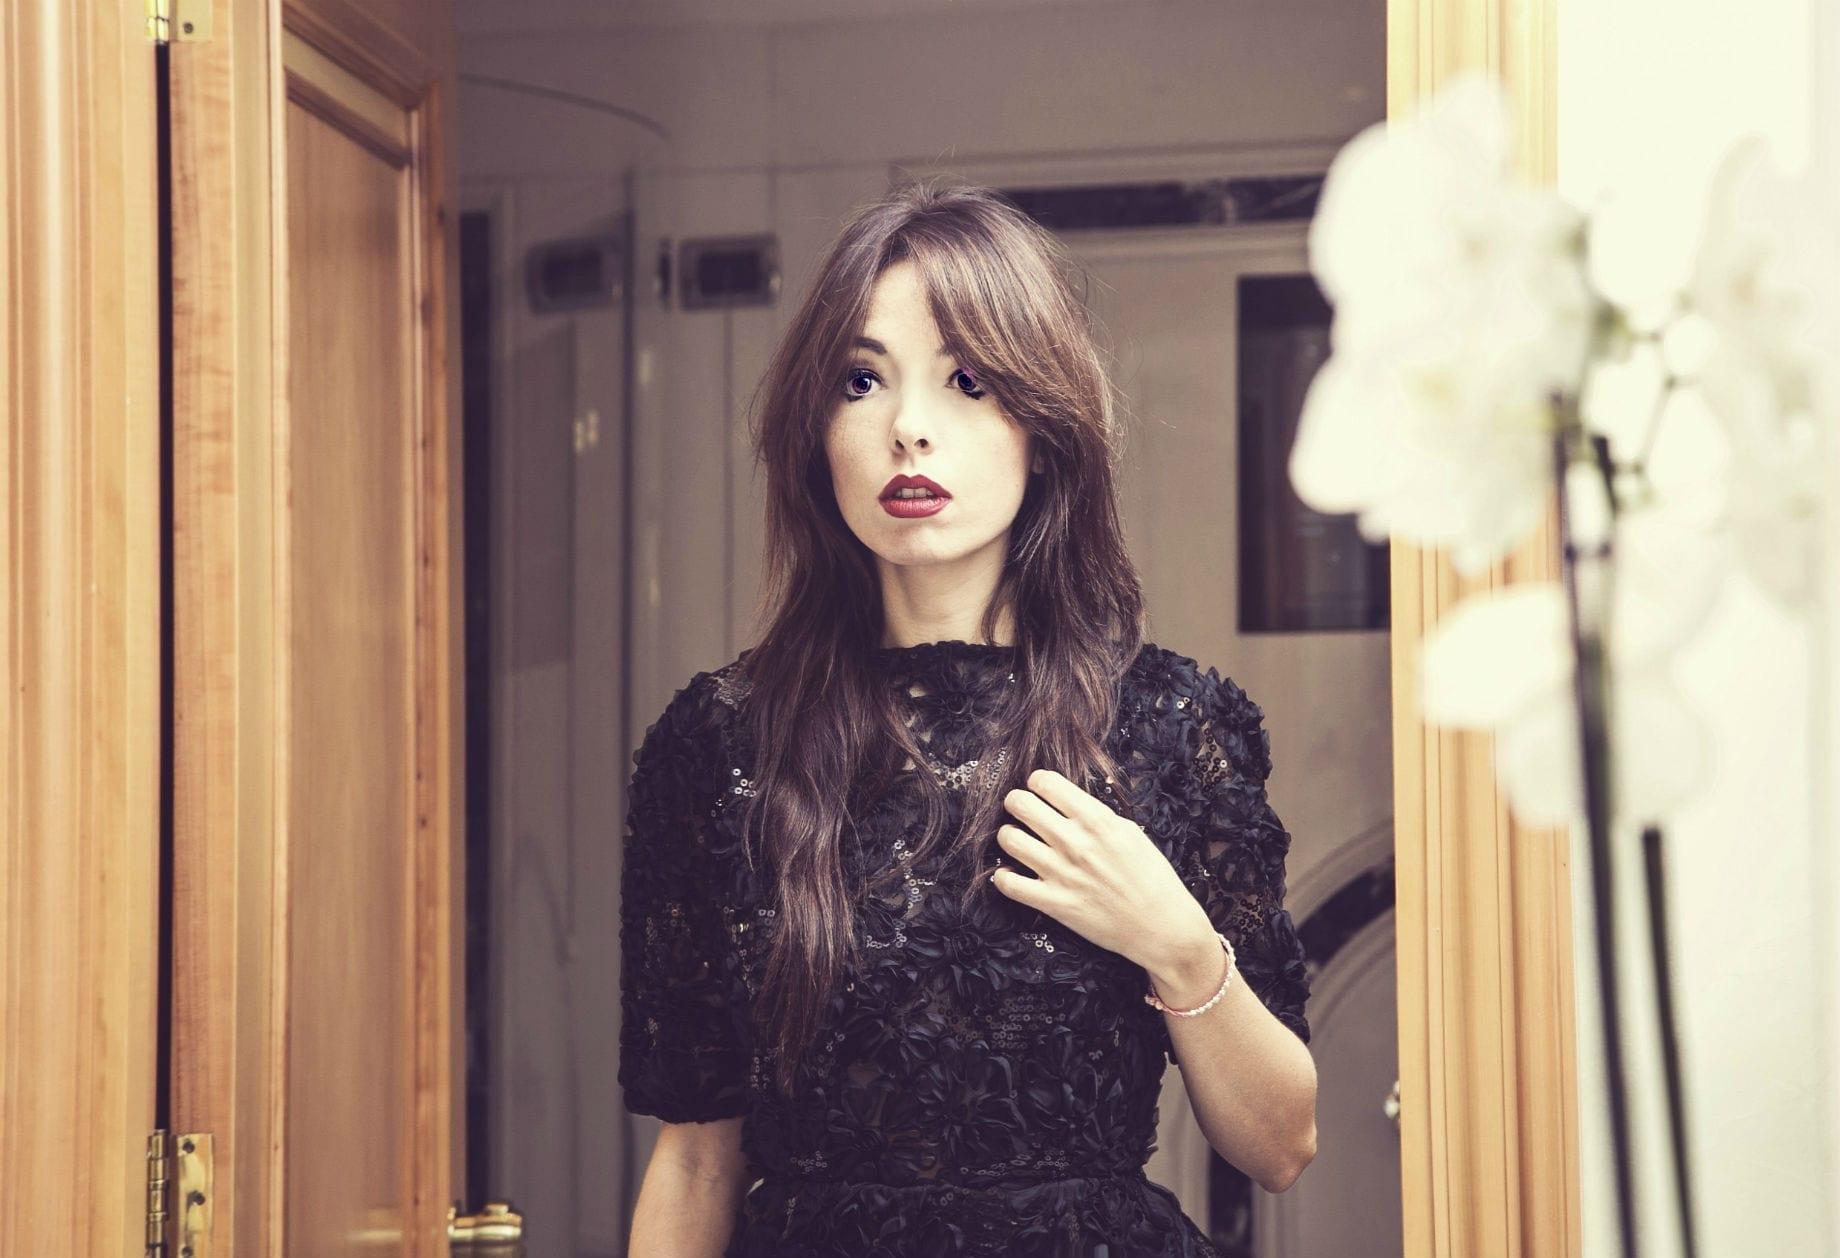 theladycracy.it, elisa bellino, fashion blogger italiane, party dress 2015, look capodanno idee, giovanna nicolai, little black dress,sfilate di moda, idee look capodanno, rome cavalieri waldorf astoria, fashion blogger famose